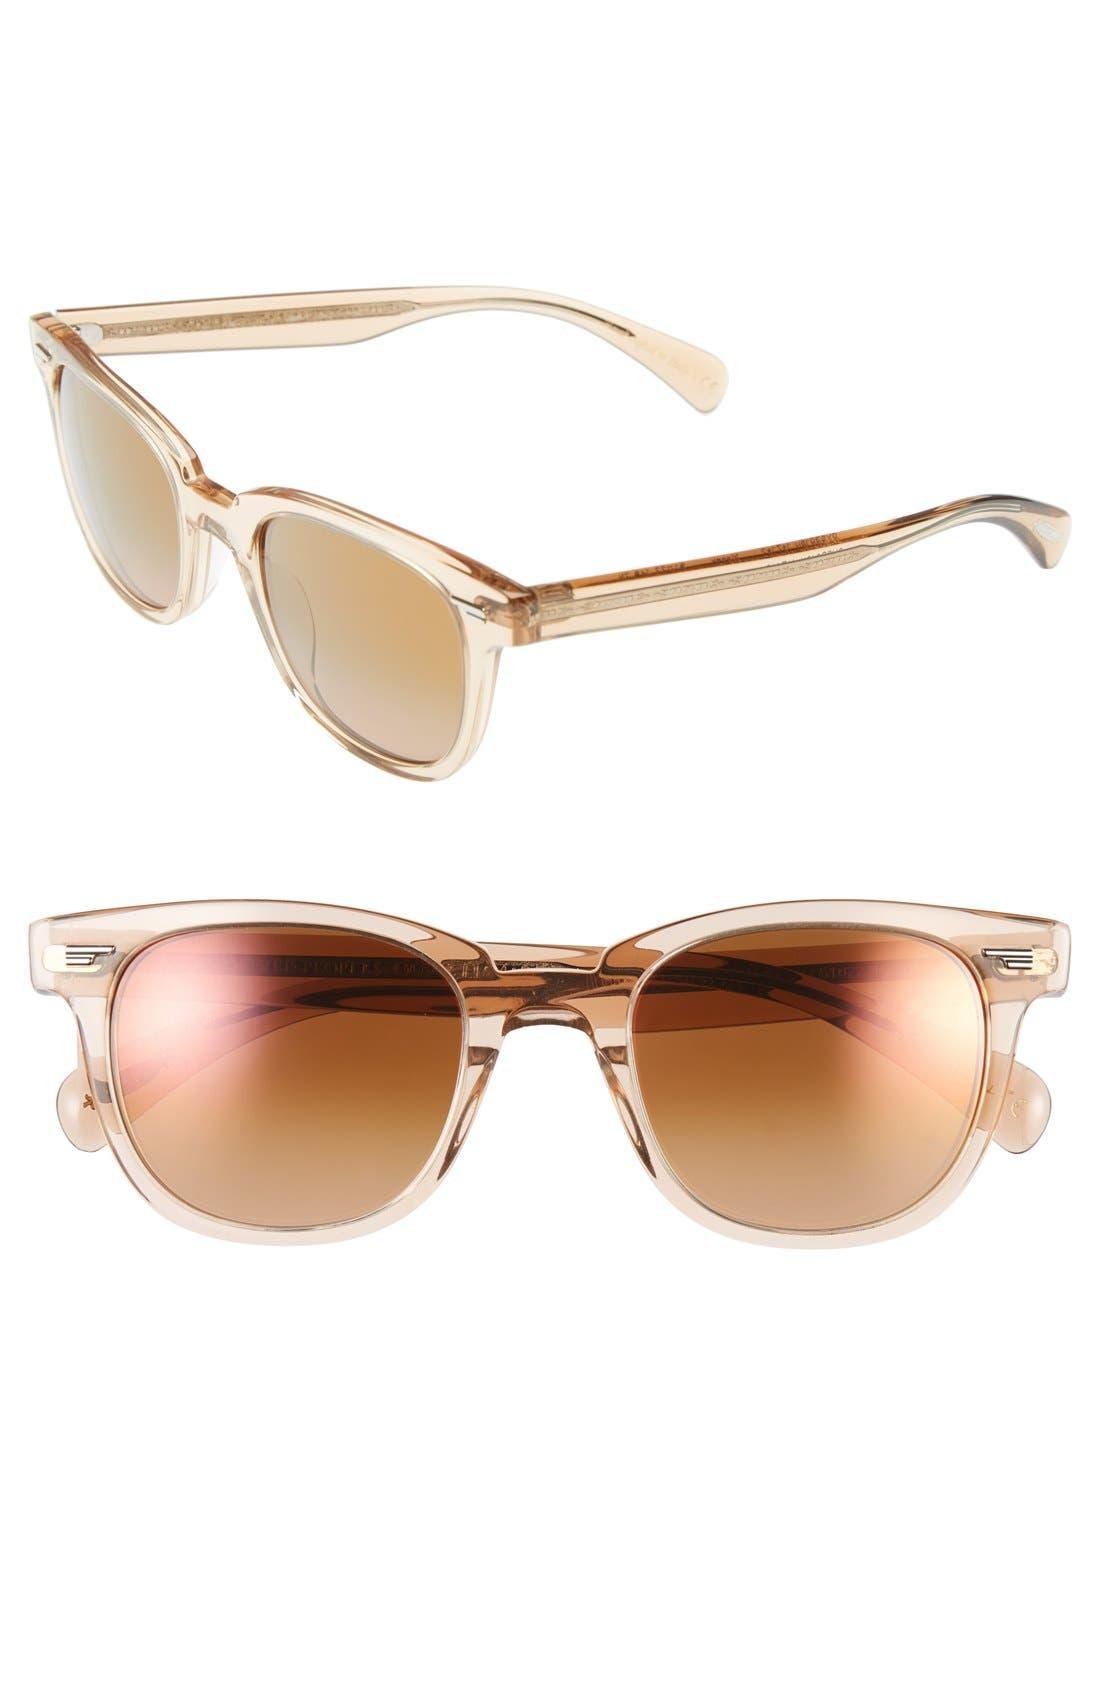 'Masek' 51mm Retro Sunglasses,                             Main thumbnail 1, color,                             Pink/ Rose Quartz Mirror